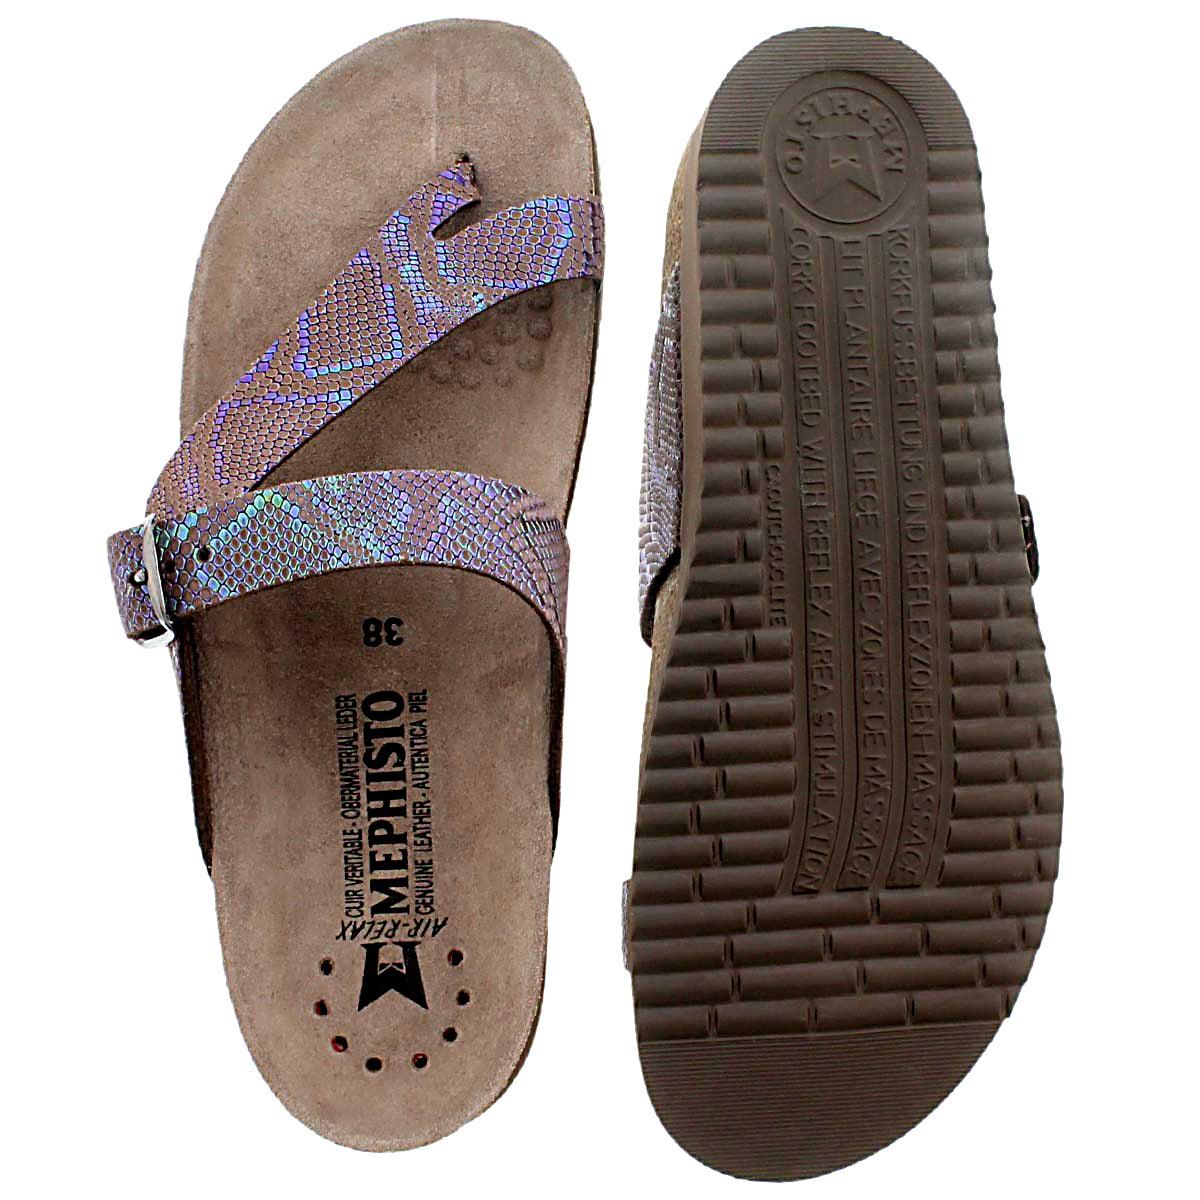 Sandales tongs Helen, brun foncé, femmes